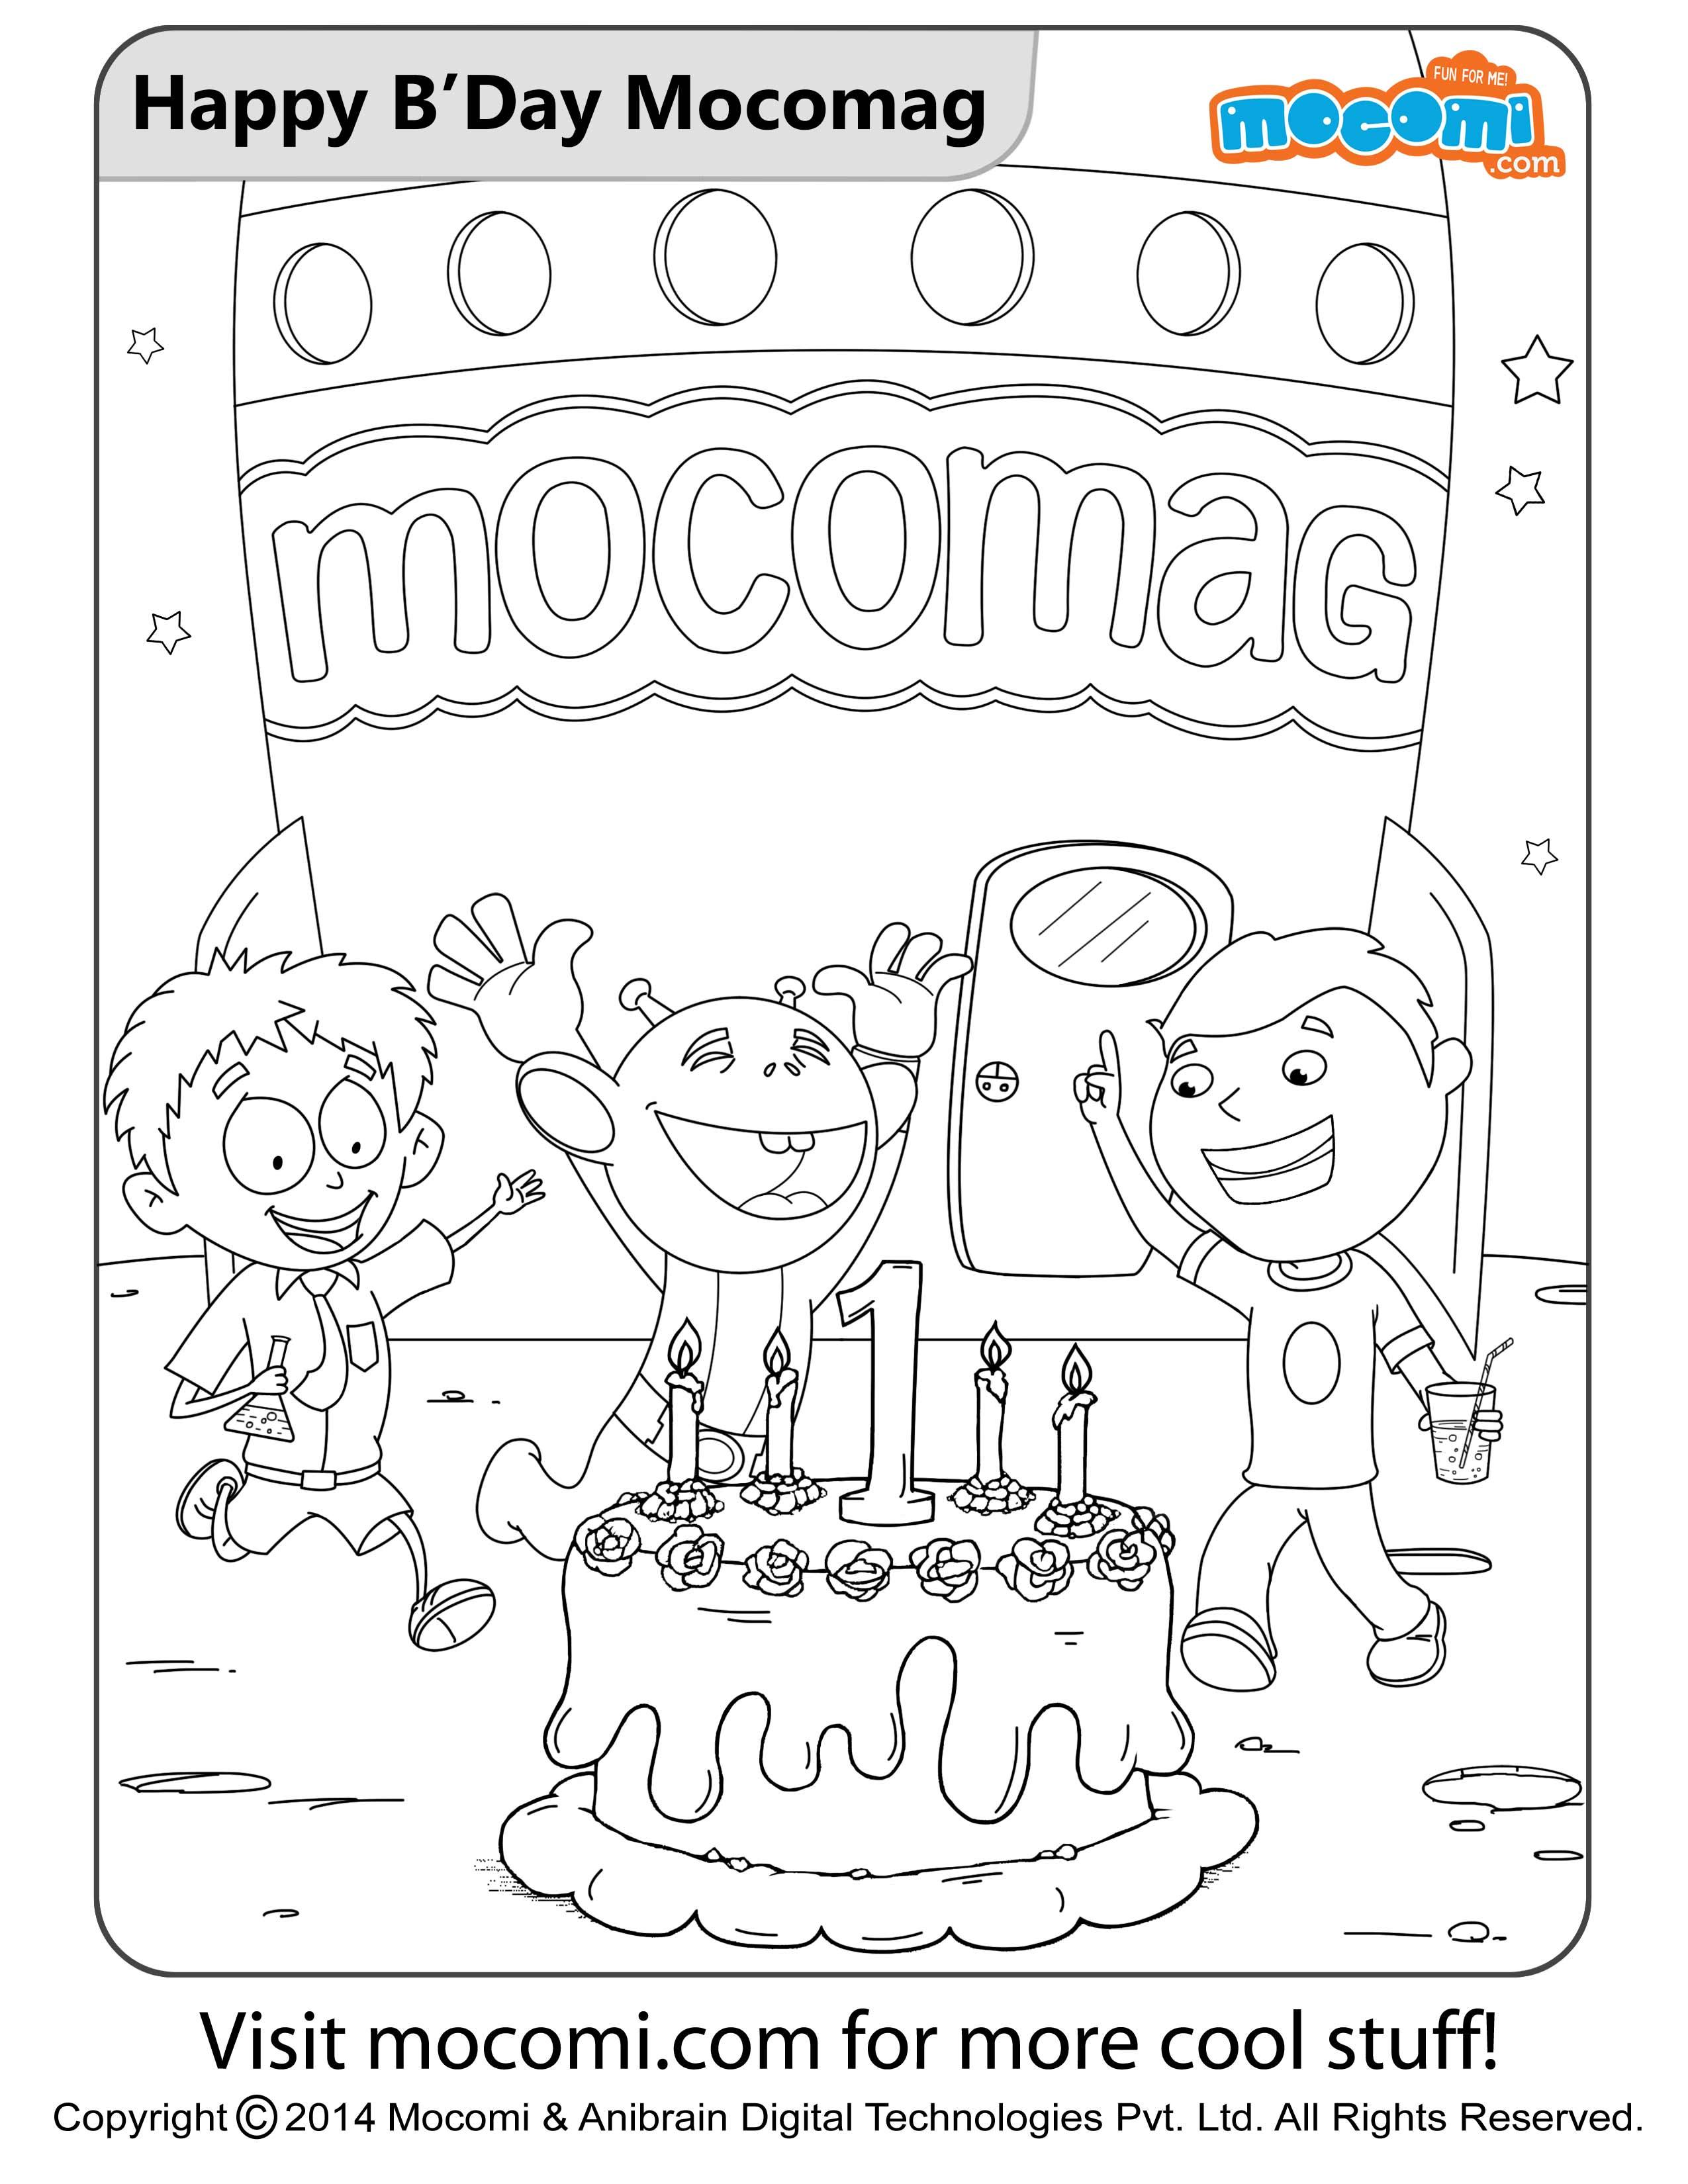 Happy Birthday Mocomag